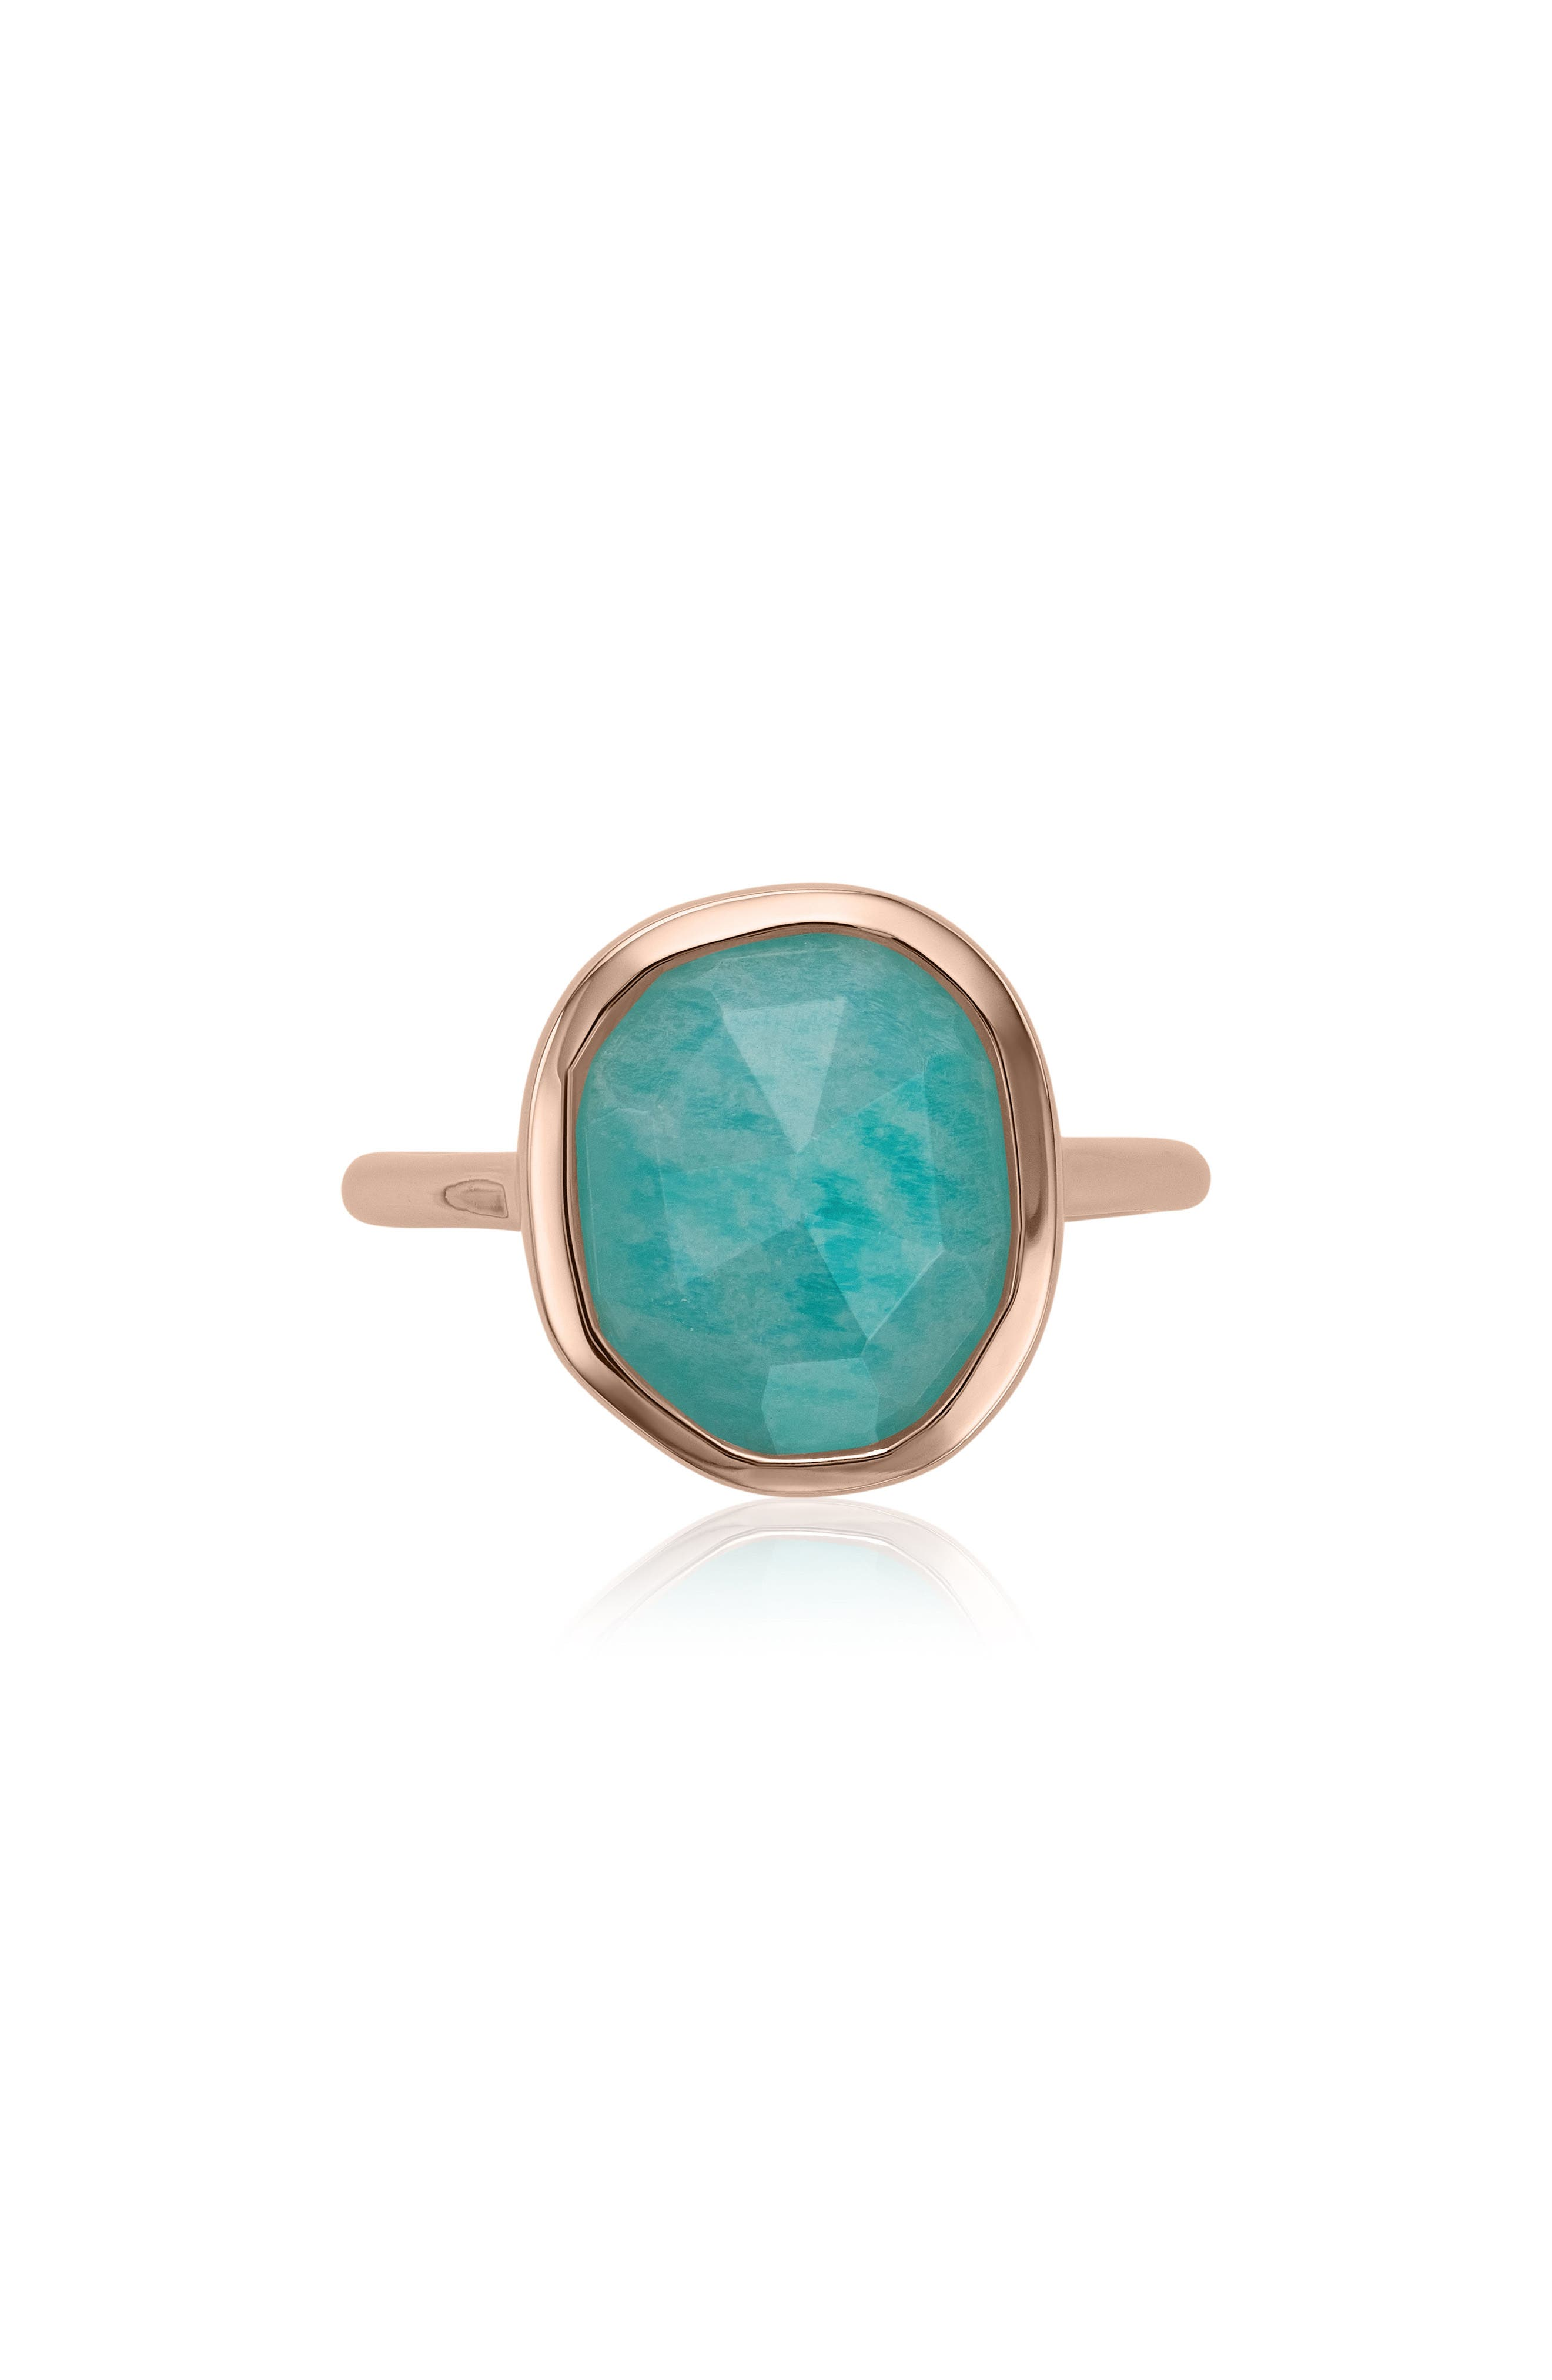 Siren Medium Semiprecious Stone Stacking Ring in Amazonite/ Rose Gold